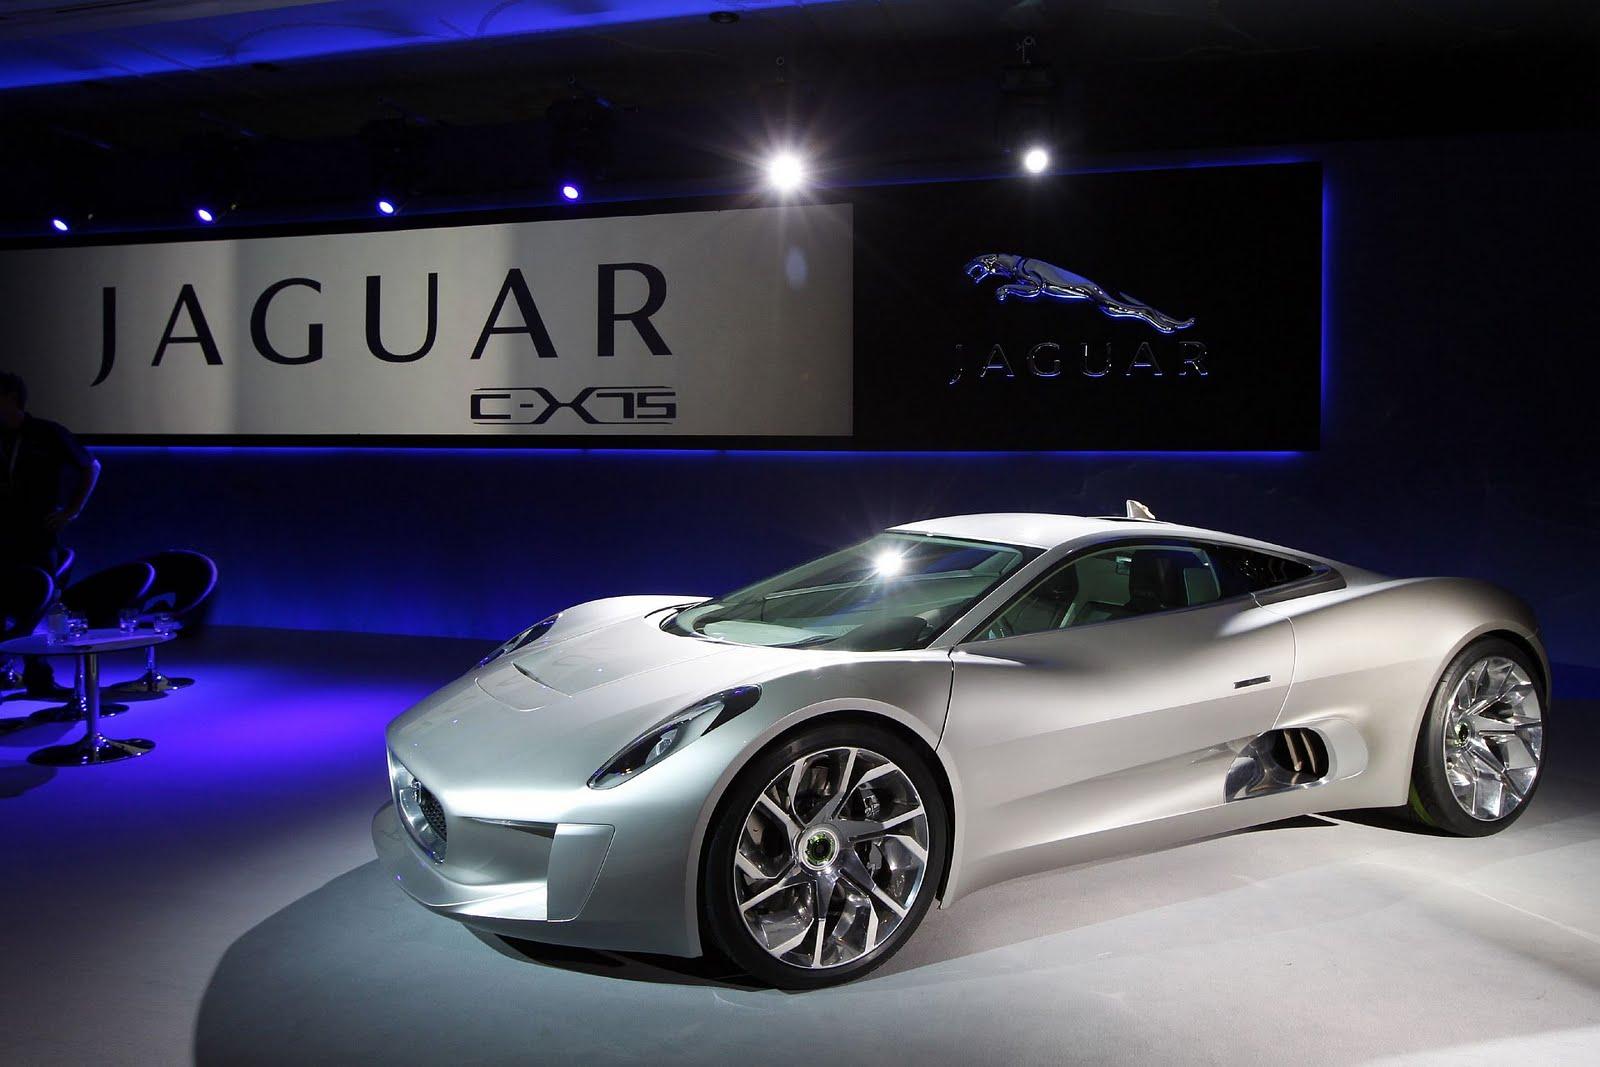 http://2.bp.blogspot.com/-OaQDYh8wowE/TkTbls-xmeI/AAAAAAAAIlE/BKWBQvjVljM/s1600/Jaguar+CX-75+Hybrid.jpg